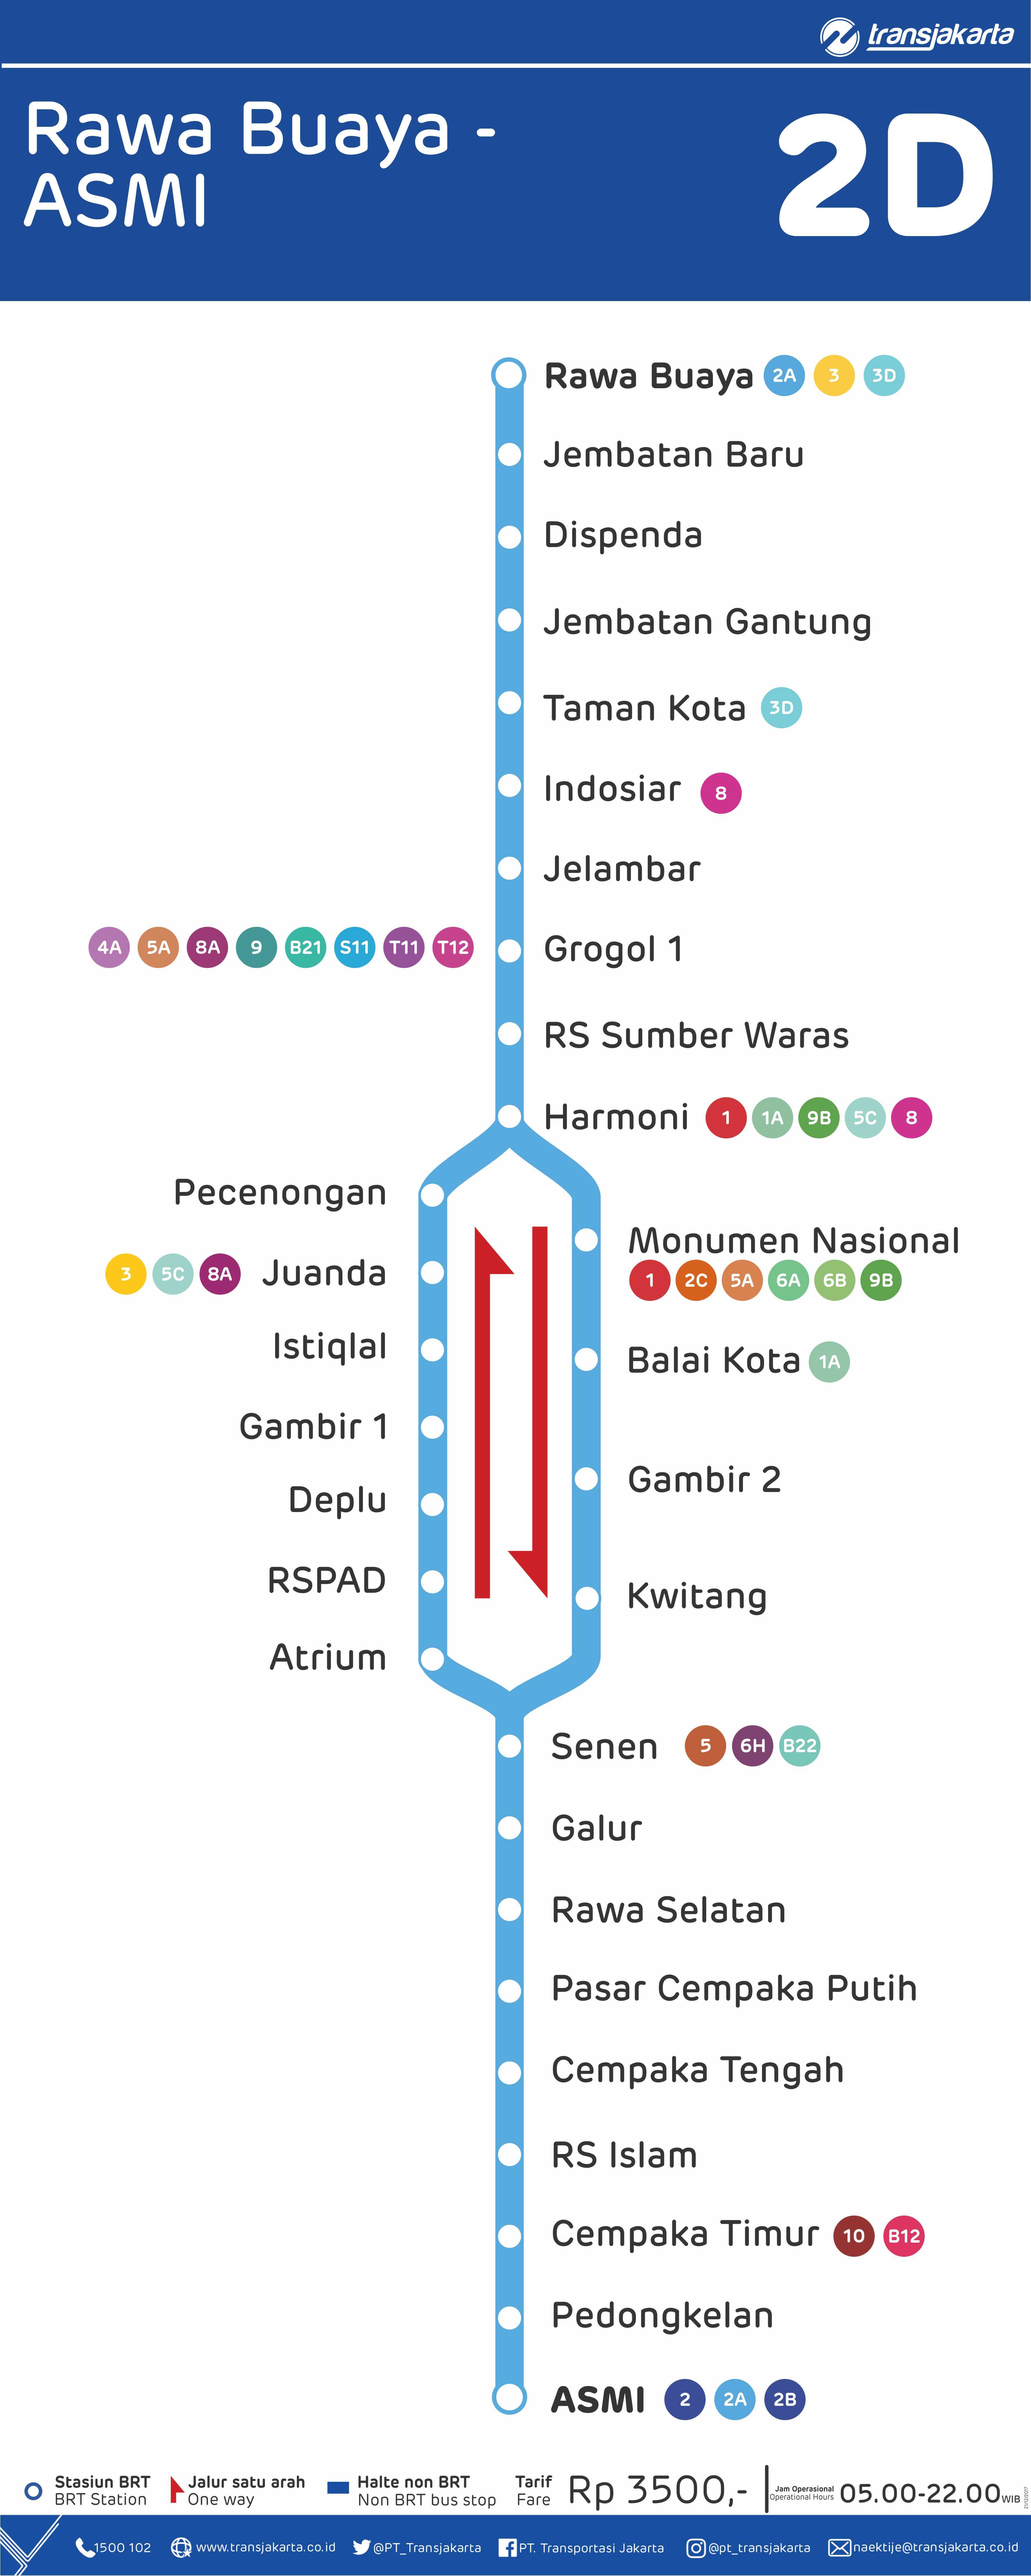 Transjakarta Asmi Rawa Buaya Via Galur Senen Taman Kota